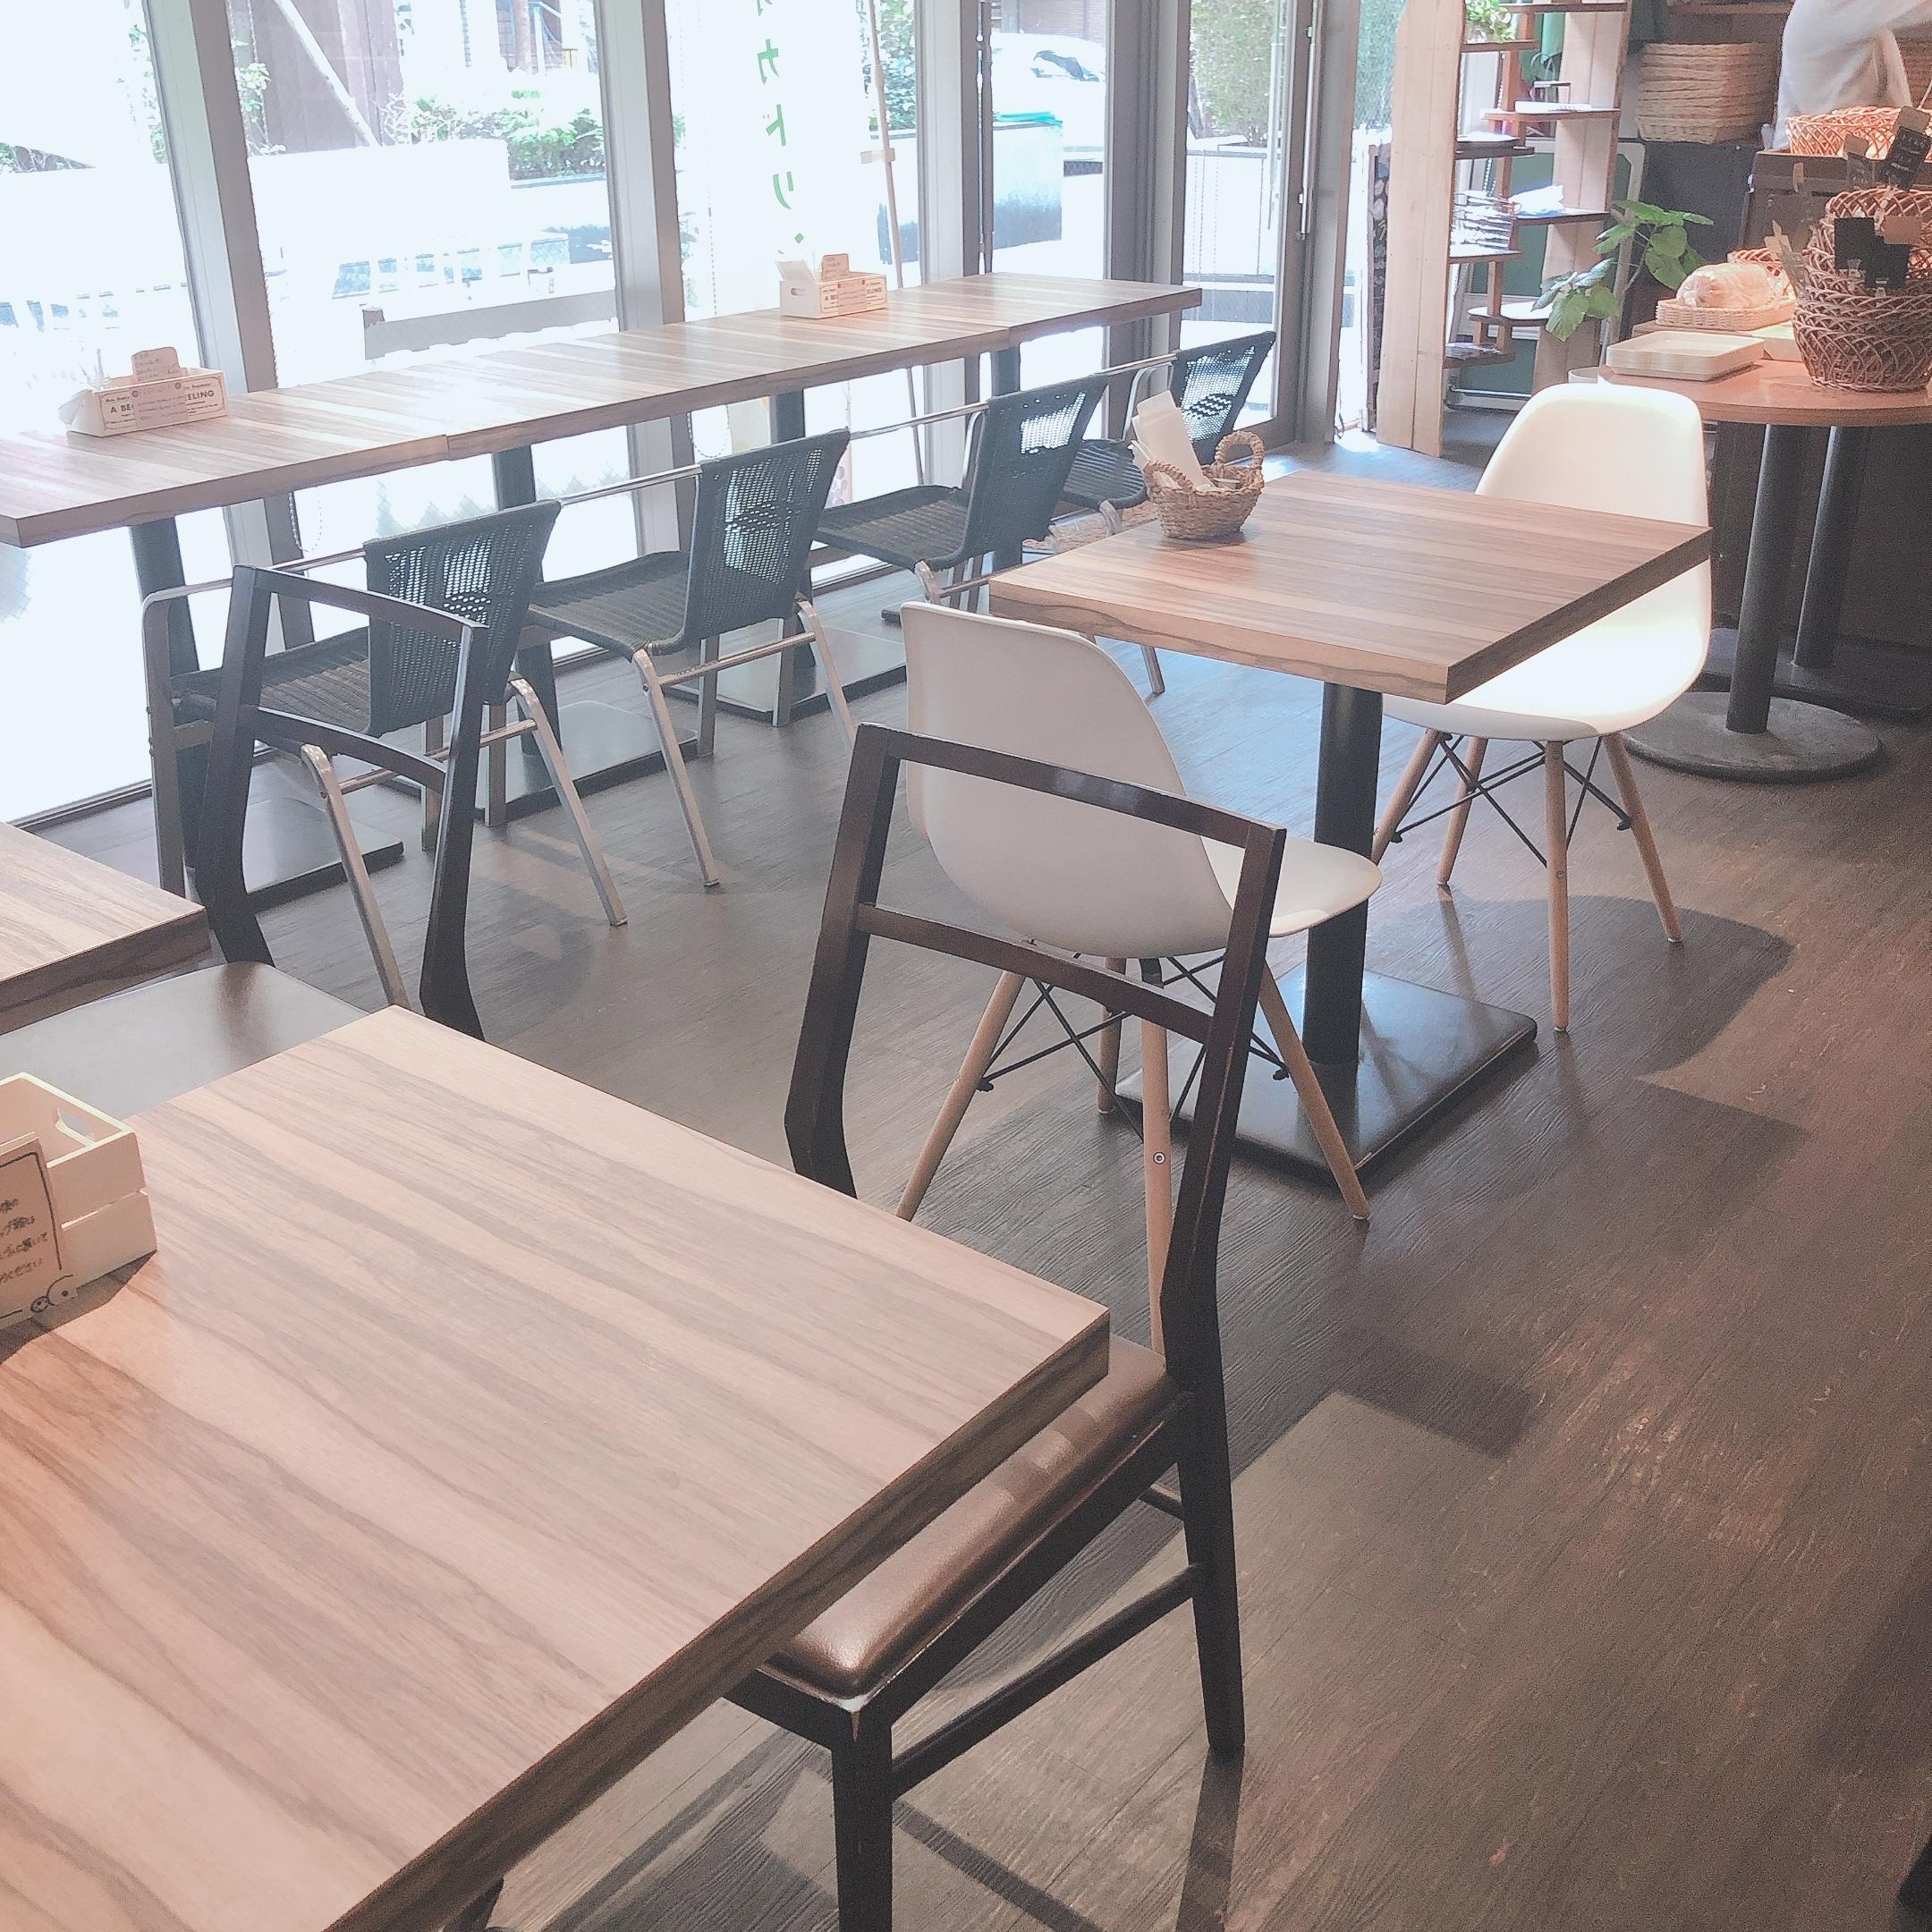 4th street bagel カフェスペースの室内の写真